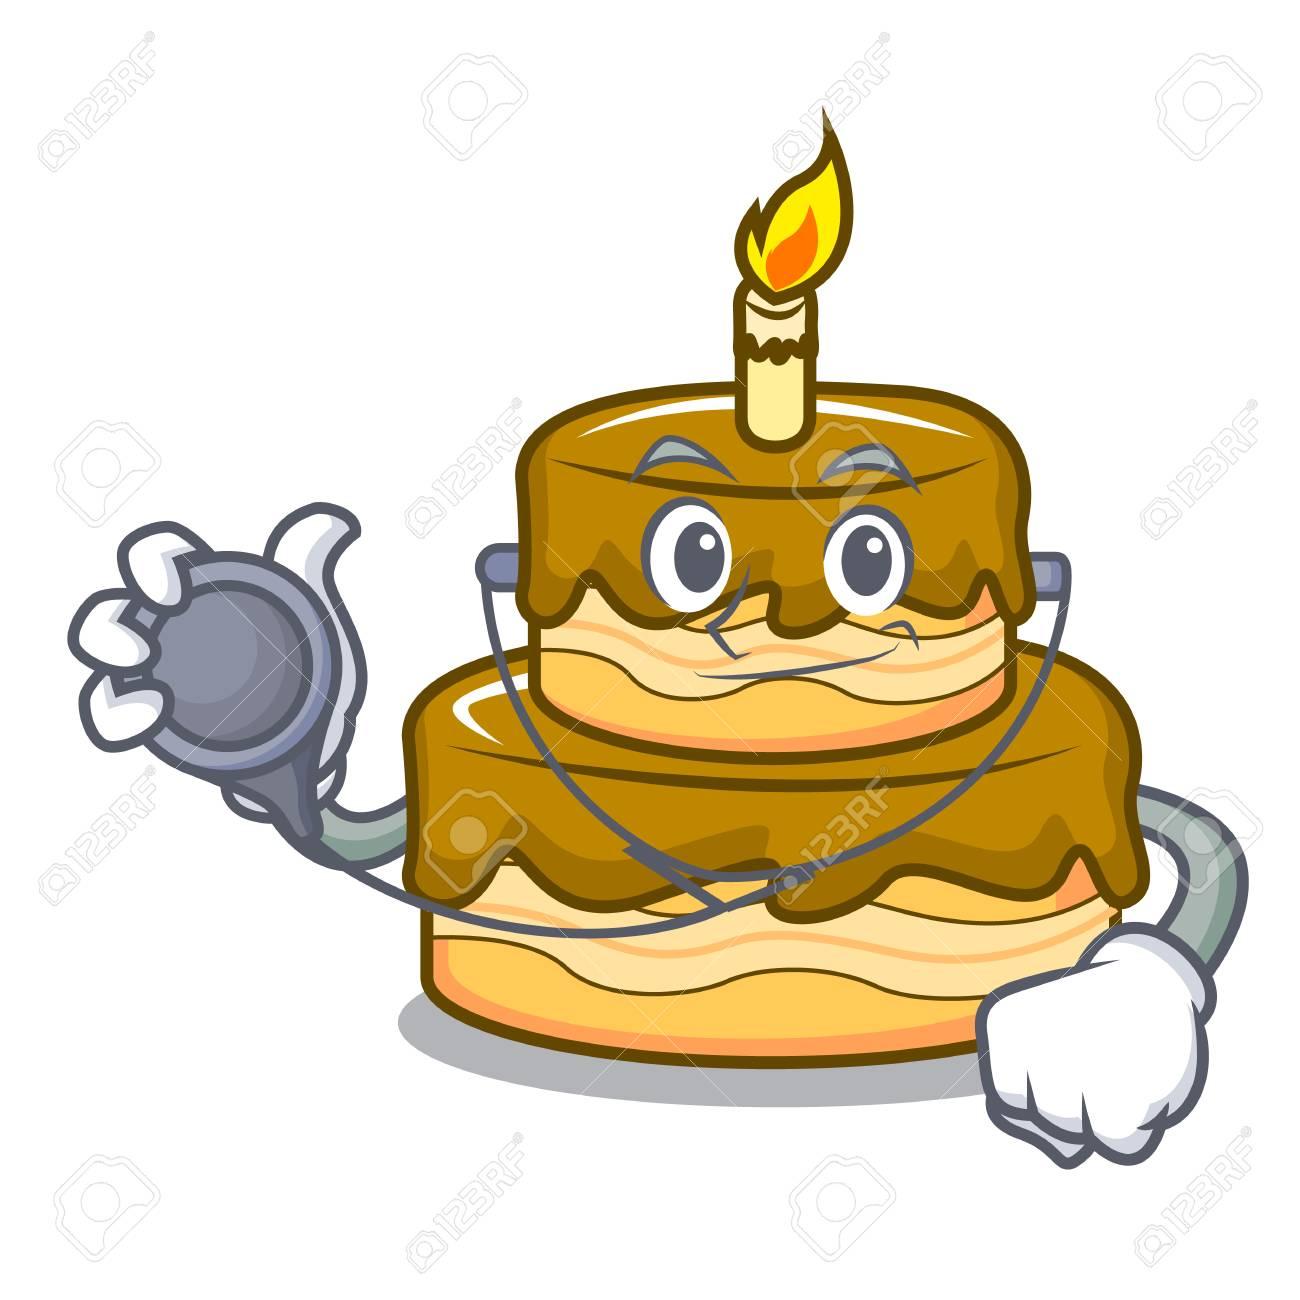 Phenomenal Doctor Birthday Cake Character Cartoon Vector Illustration Royalty Birthday Cards Printable Trancafe Filternl